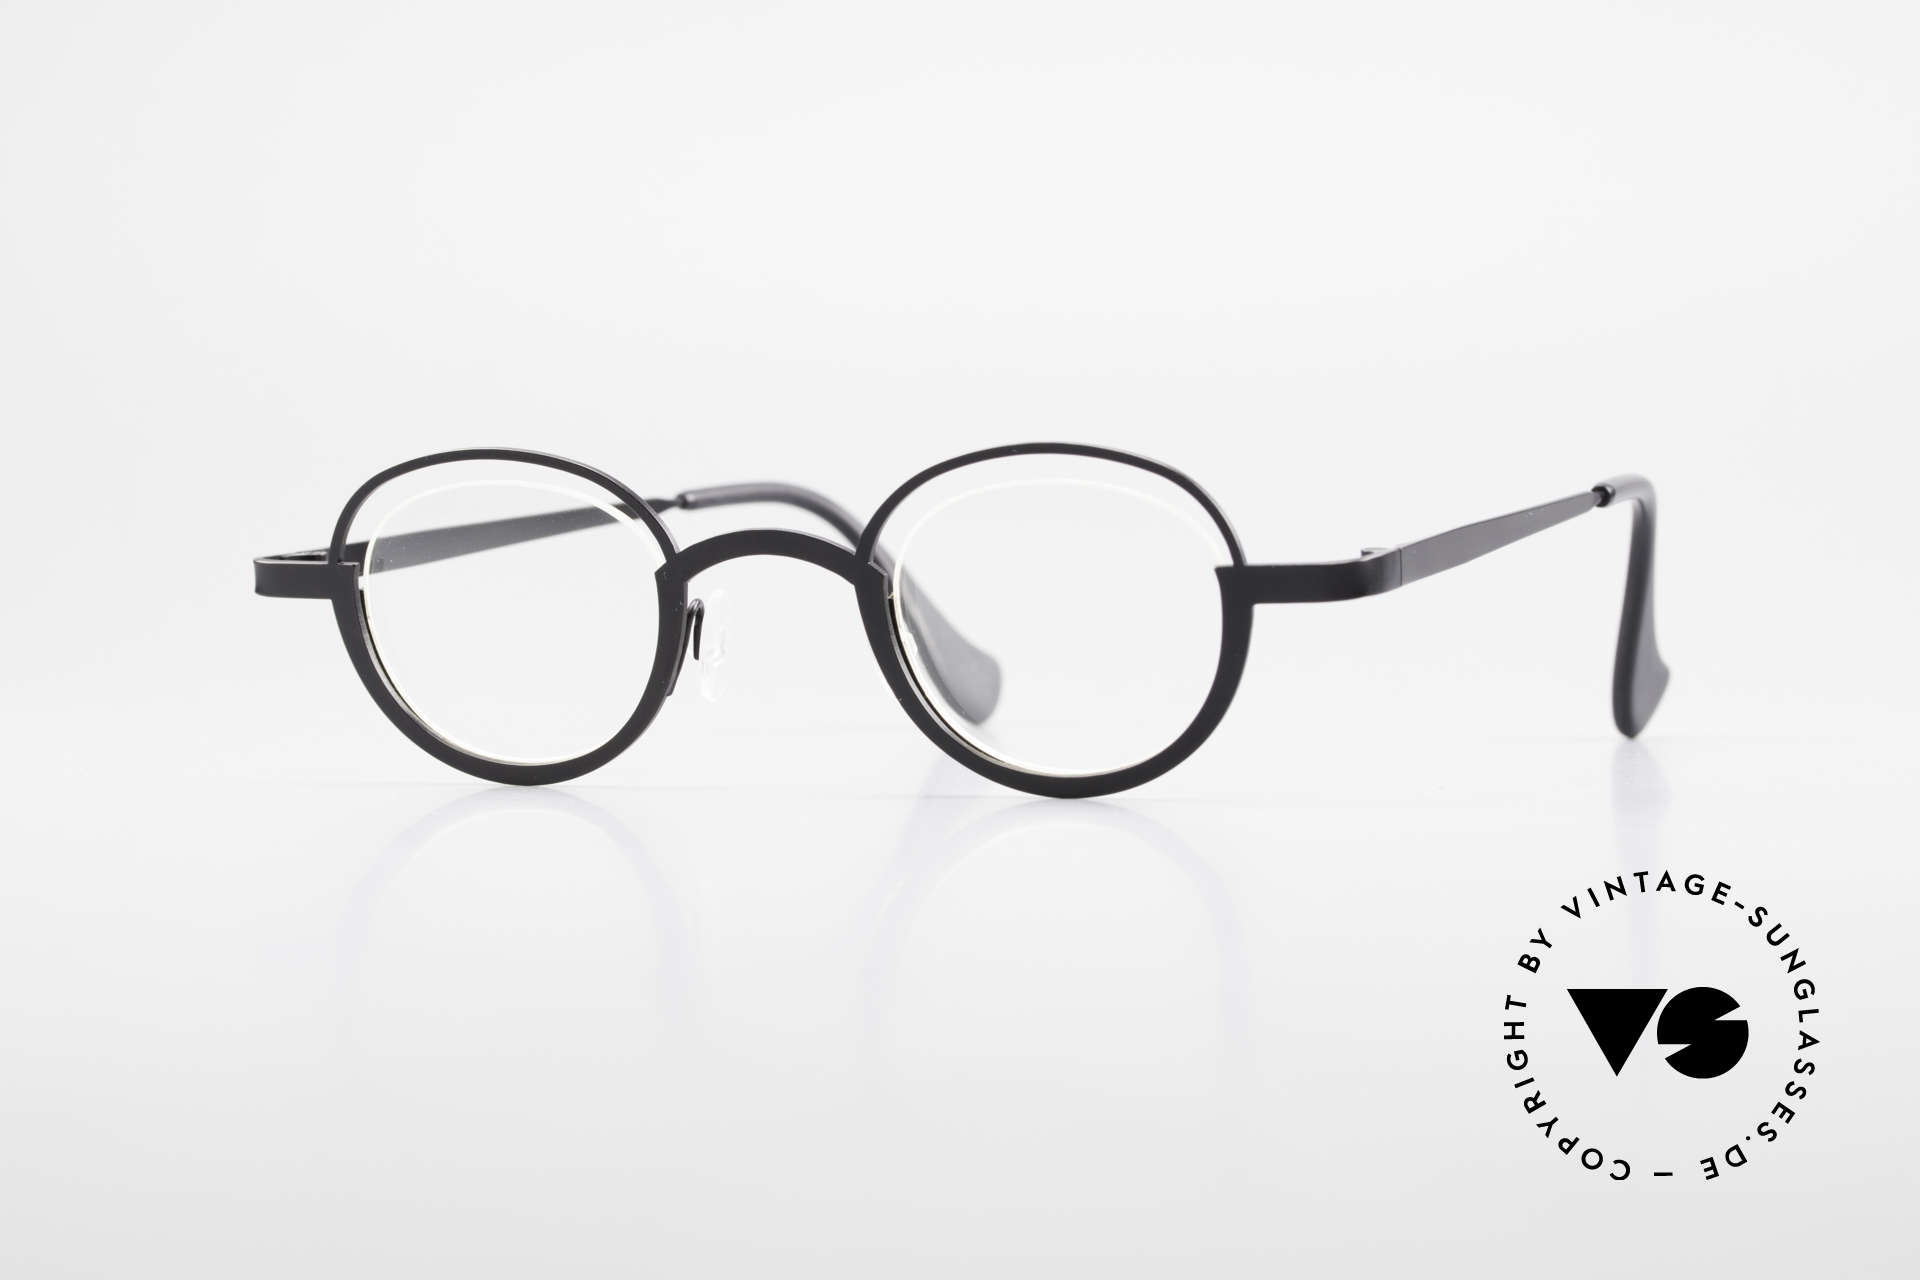 Theo Belgium Dozy Slim Rimless 90's Metal Eyeglasses, vintage THEO Belgium eyeglass-frame from app. '97, Made for Men and Women